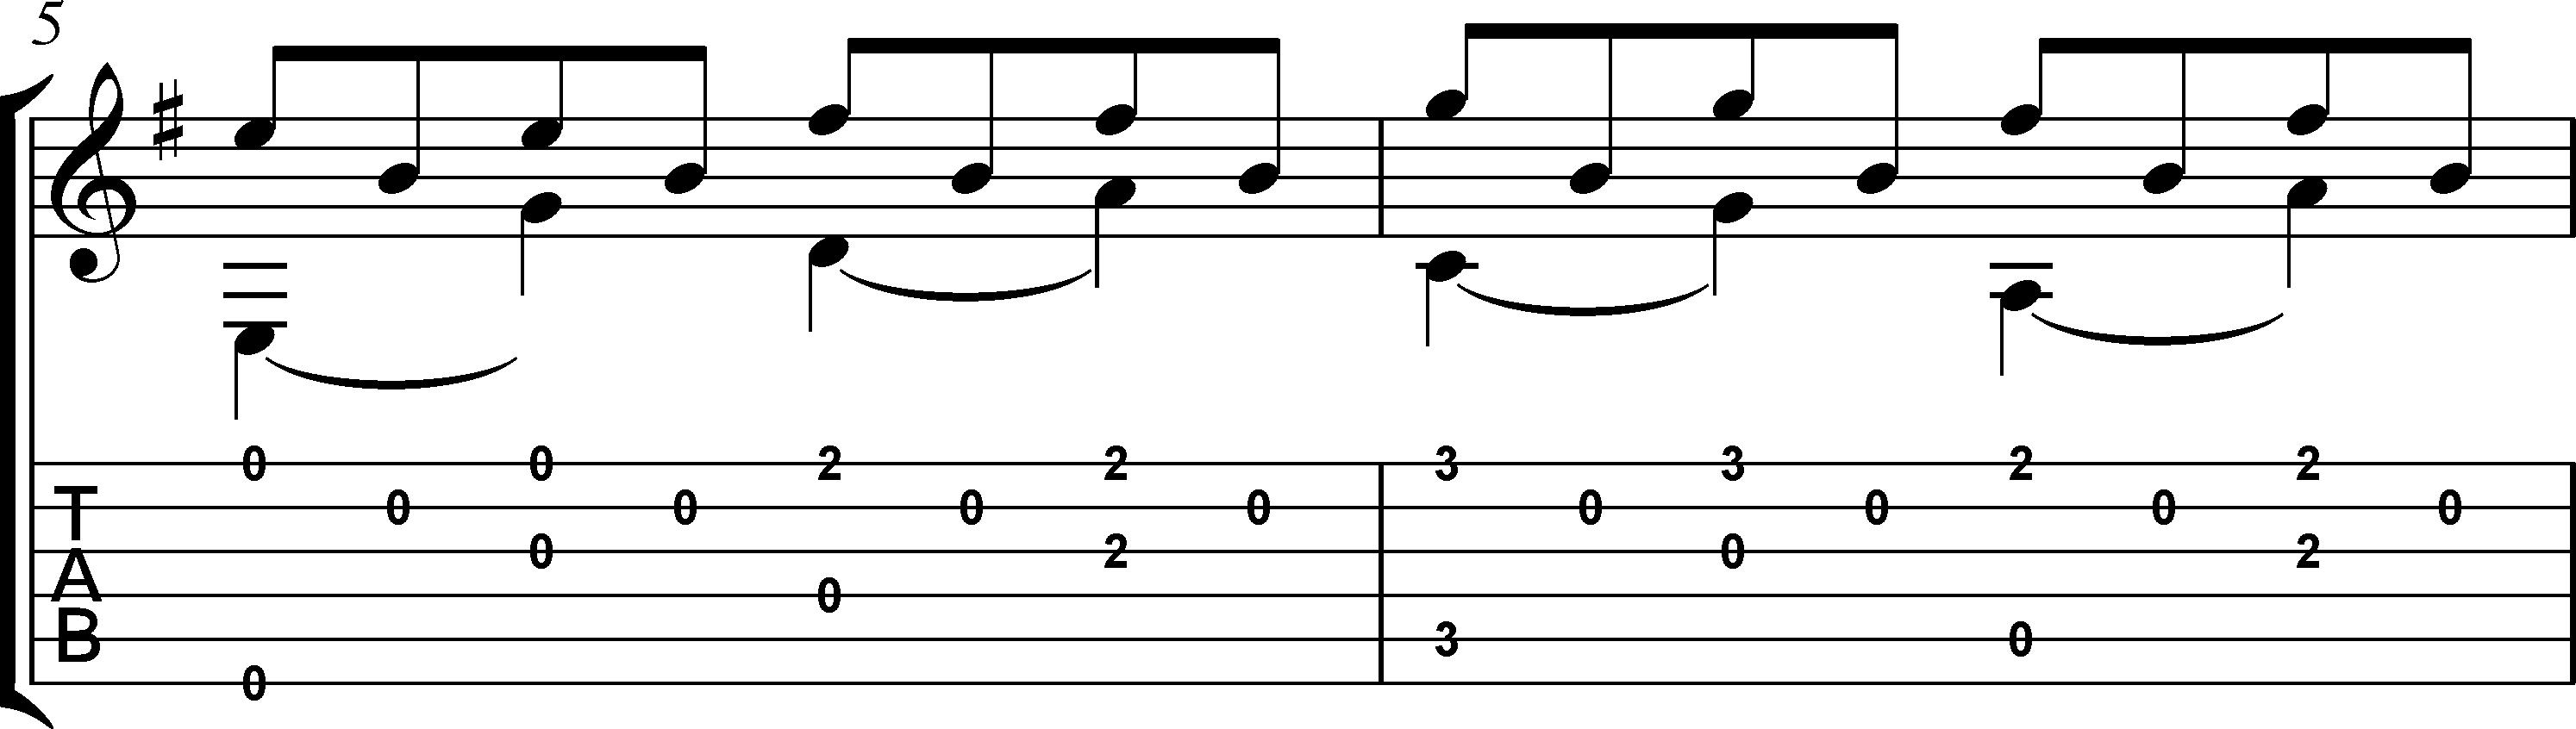 Andandino para guitarra partitura + tablatura 3